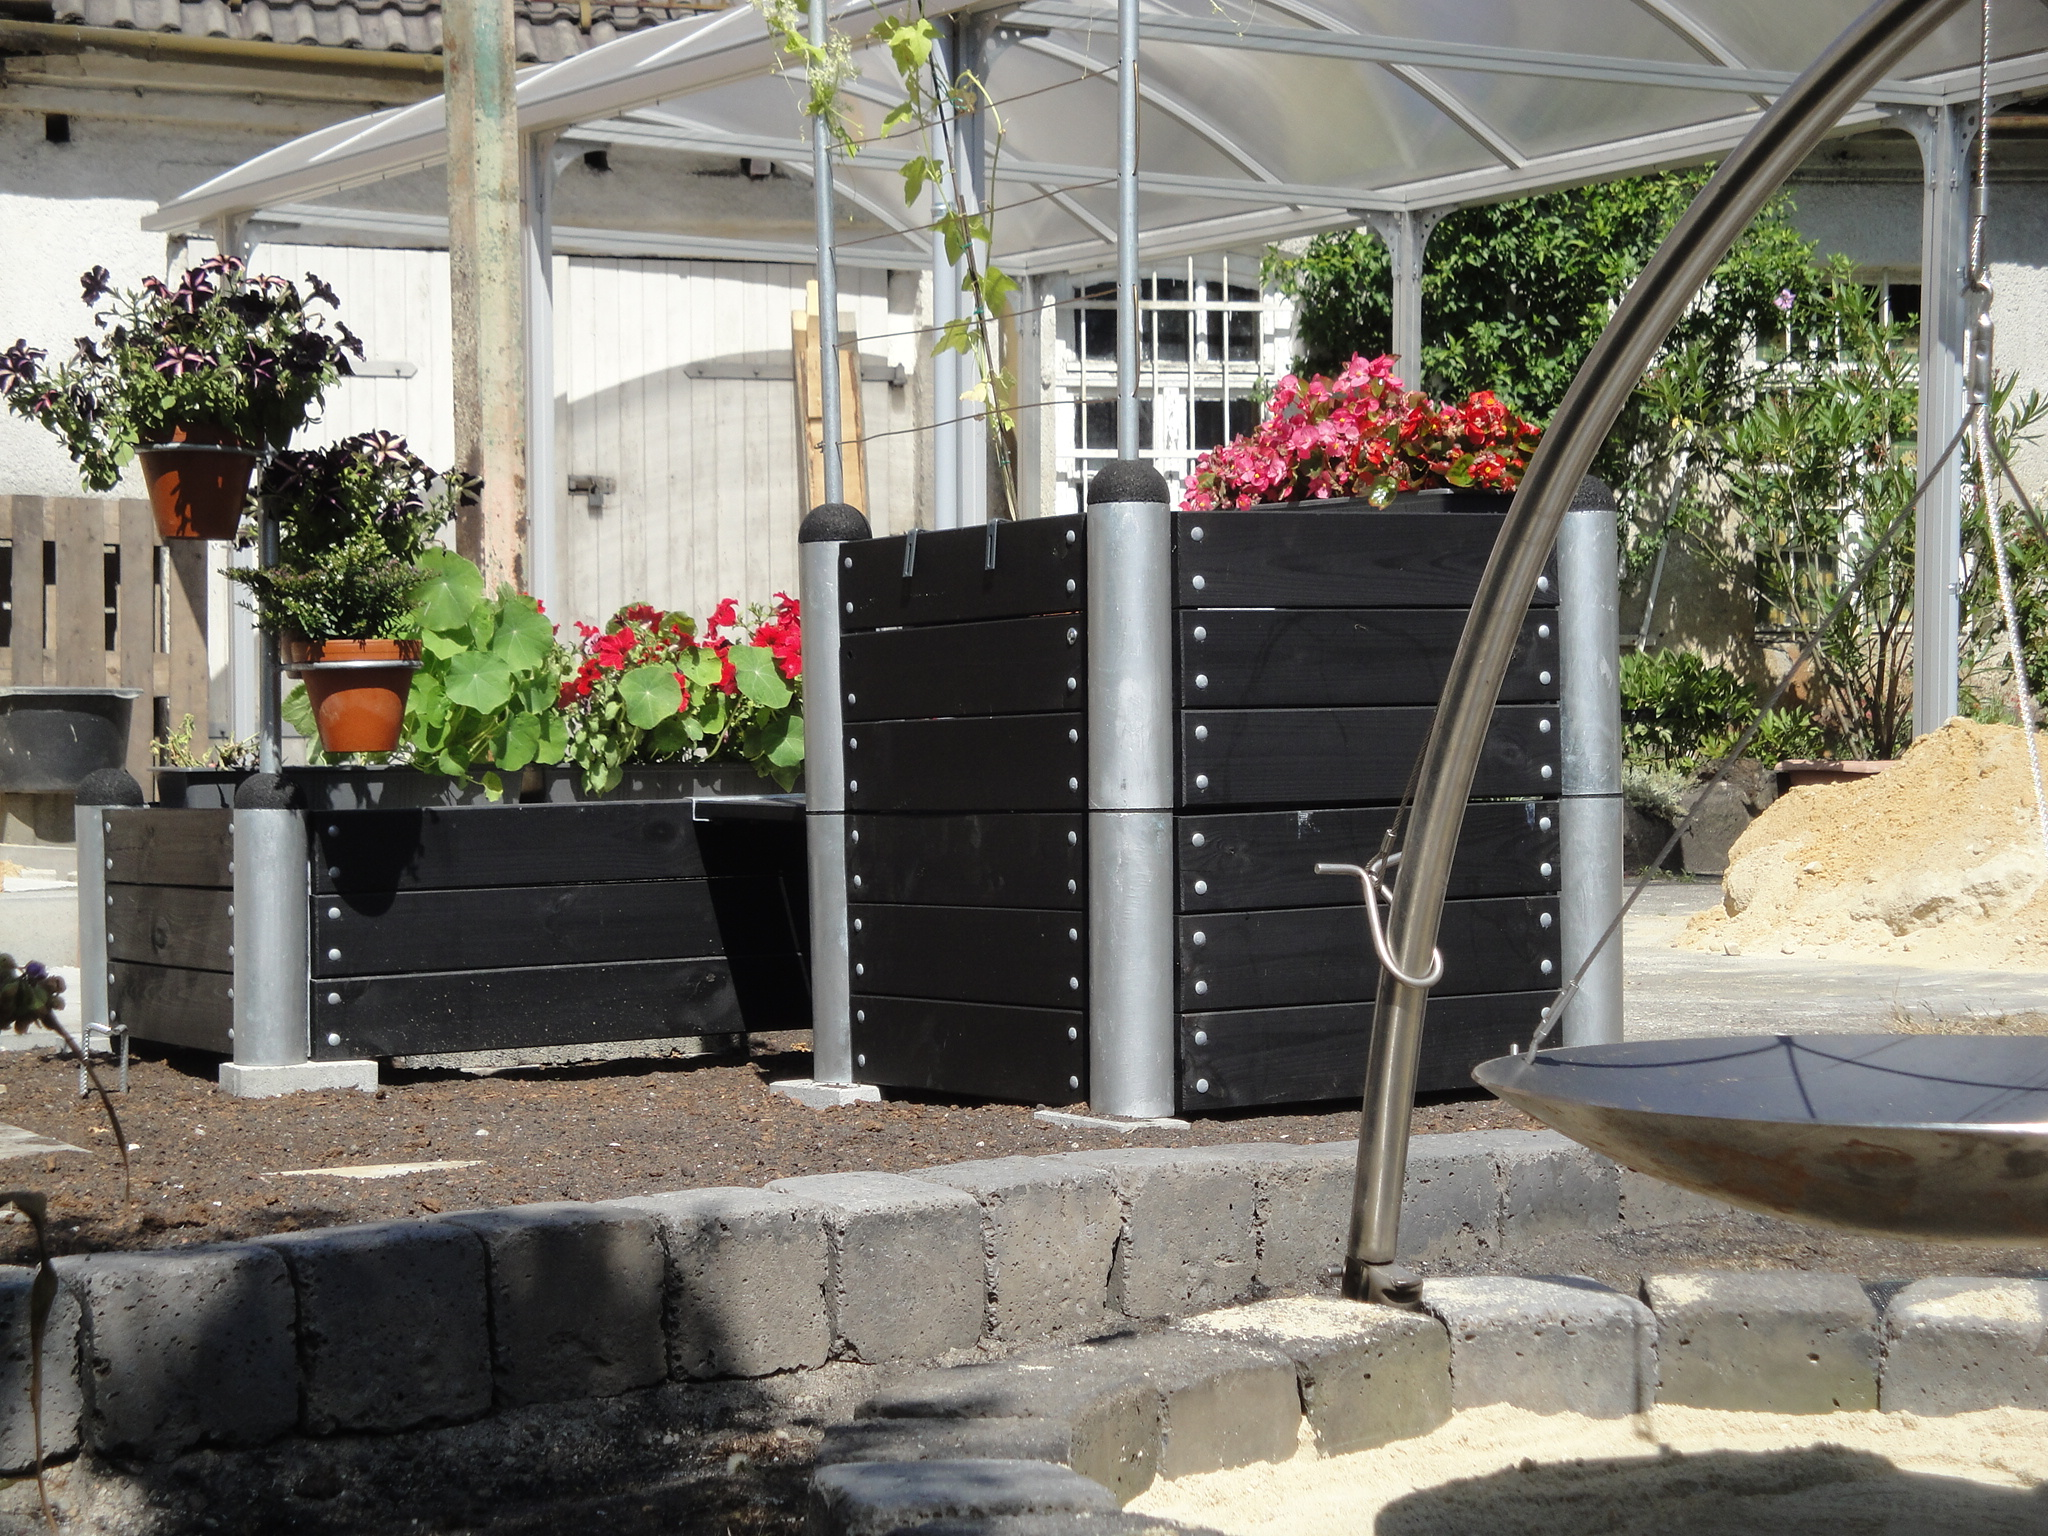 gartentraeume pergola system sitzecke gartenmoebel trockengestell hochbeet gartendusche himmelbett. Black Bedroom Furniture Sets. Home Design Ideas